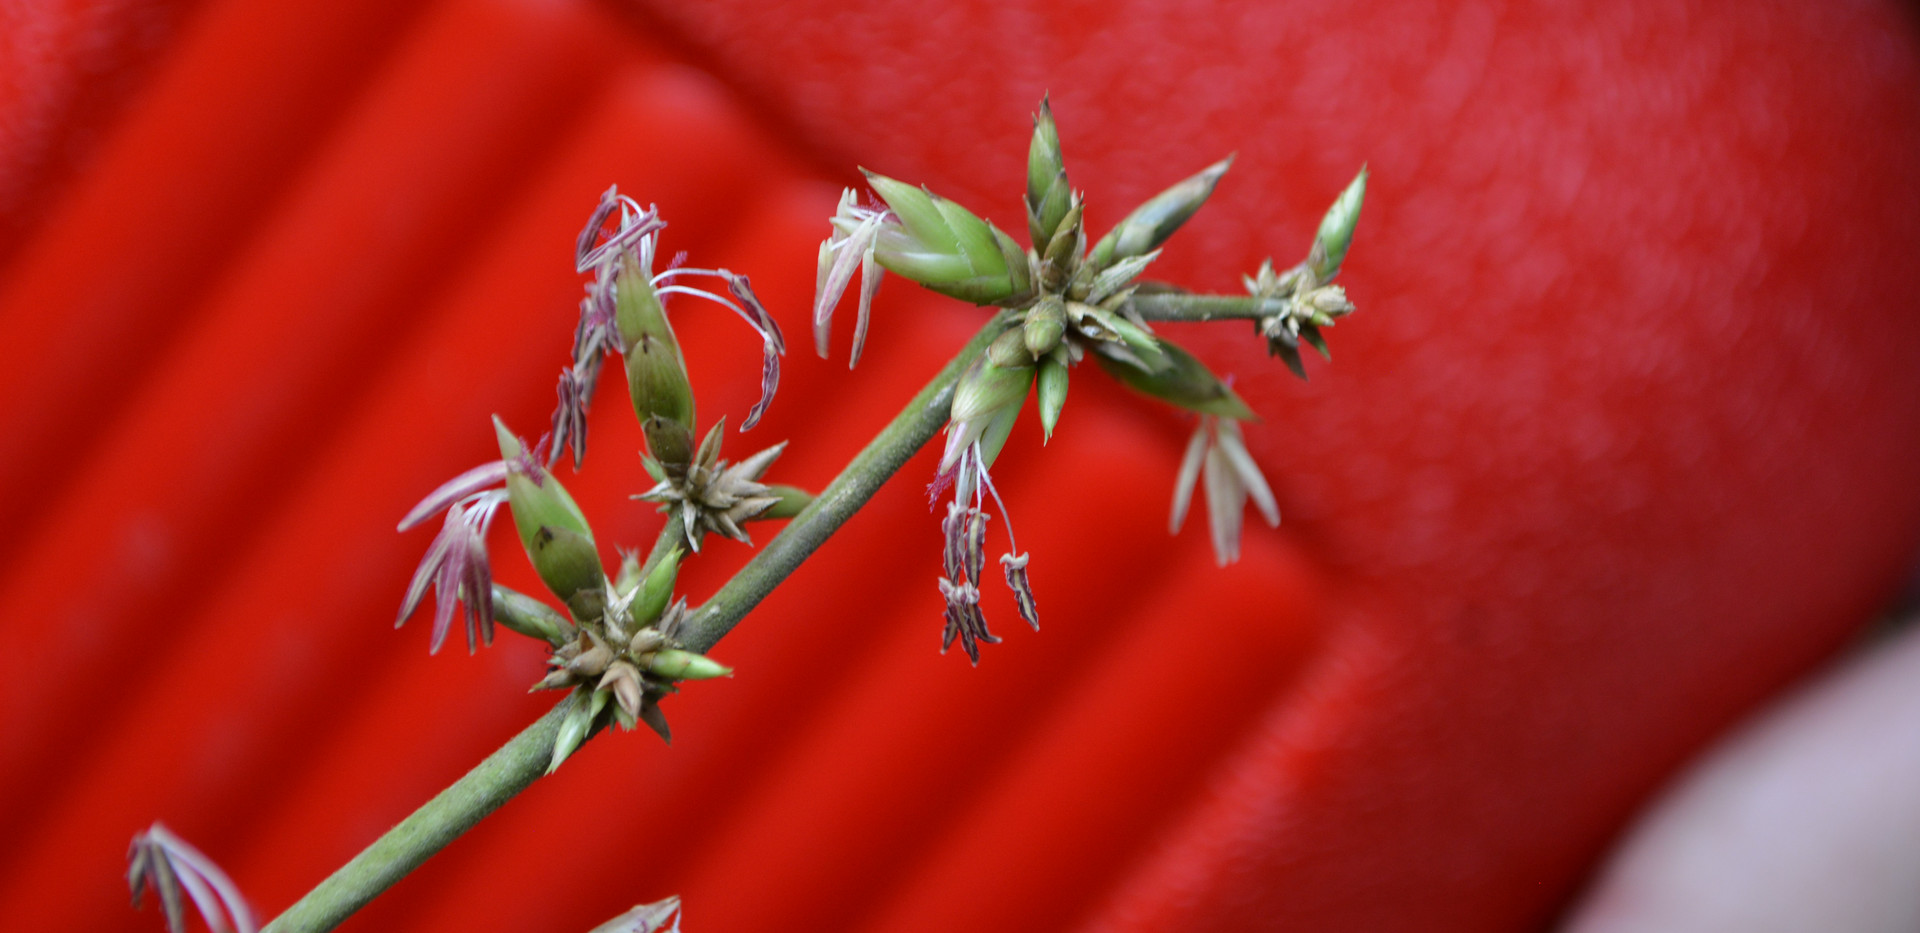 Flor do bambu